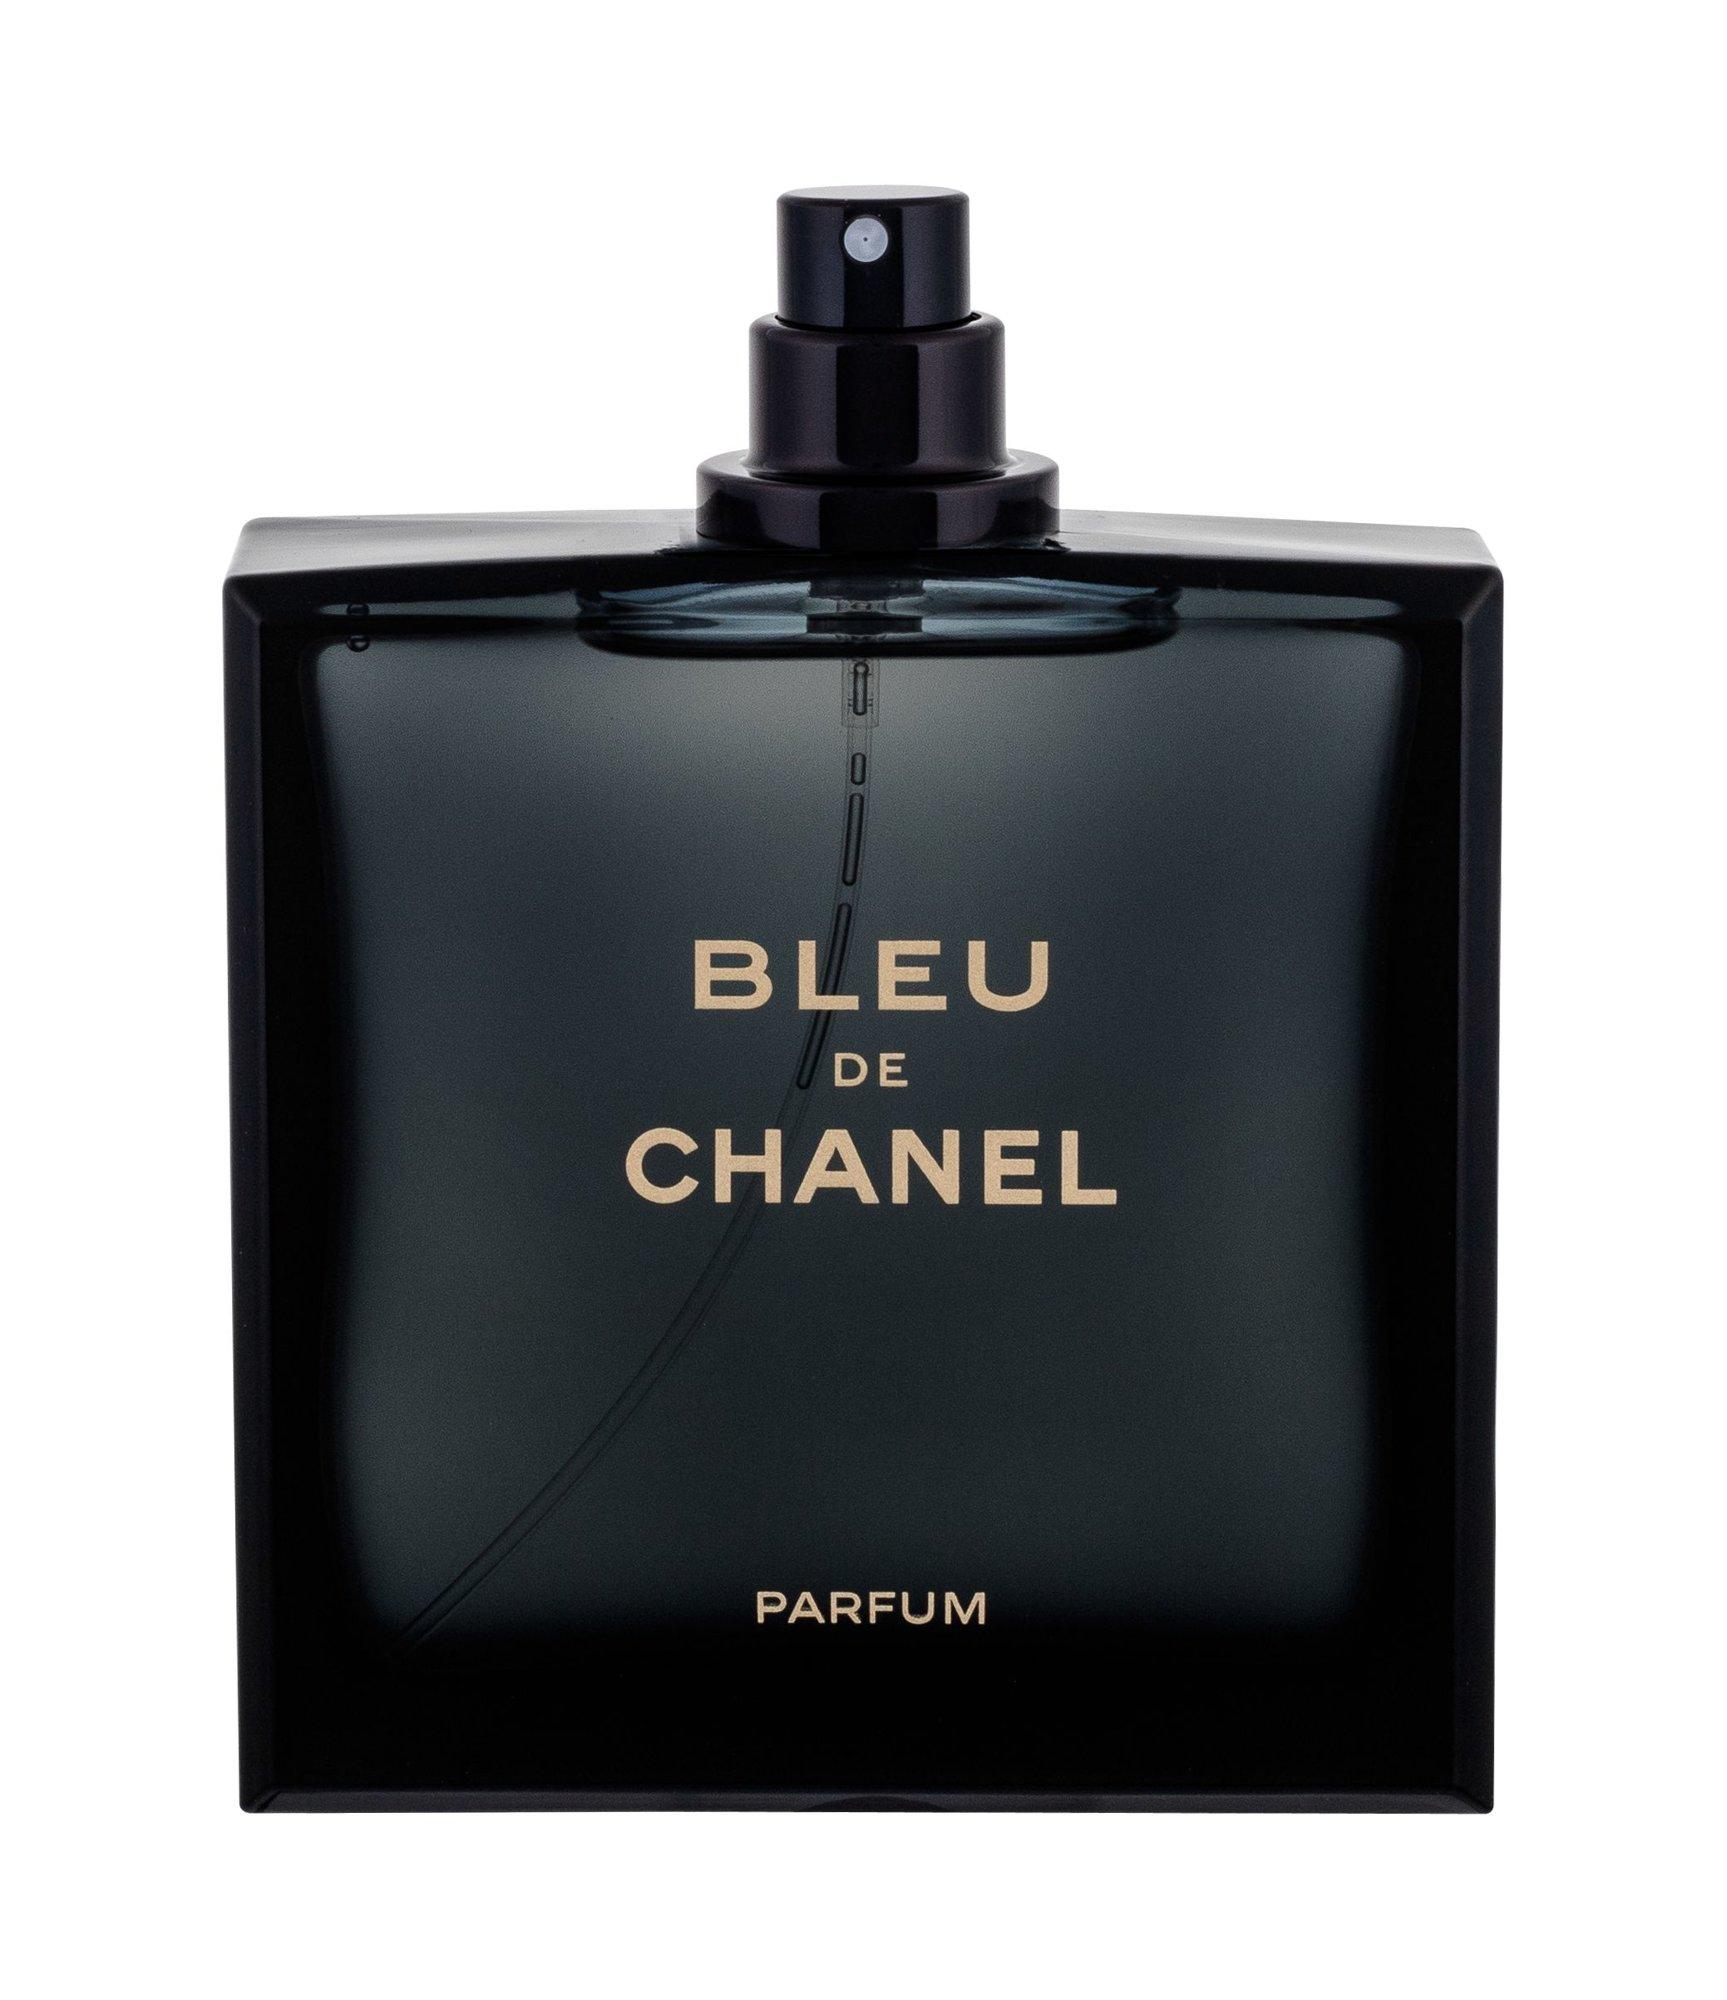 Chanel Bleu de Chanel Perfume 100ml